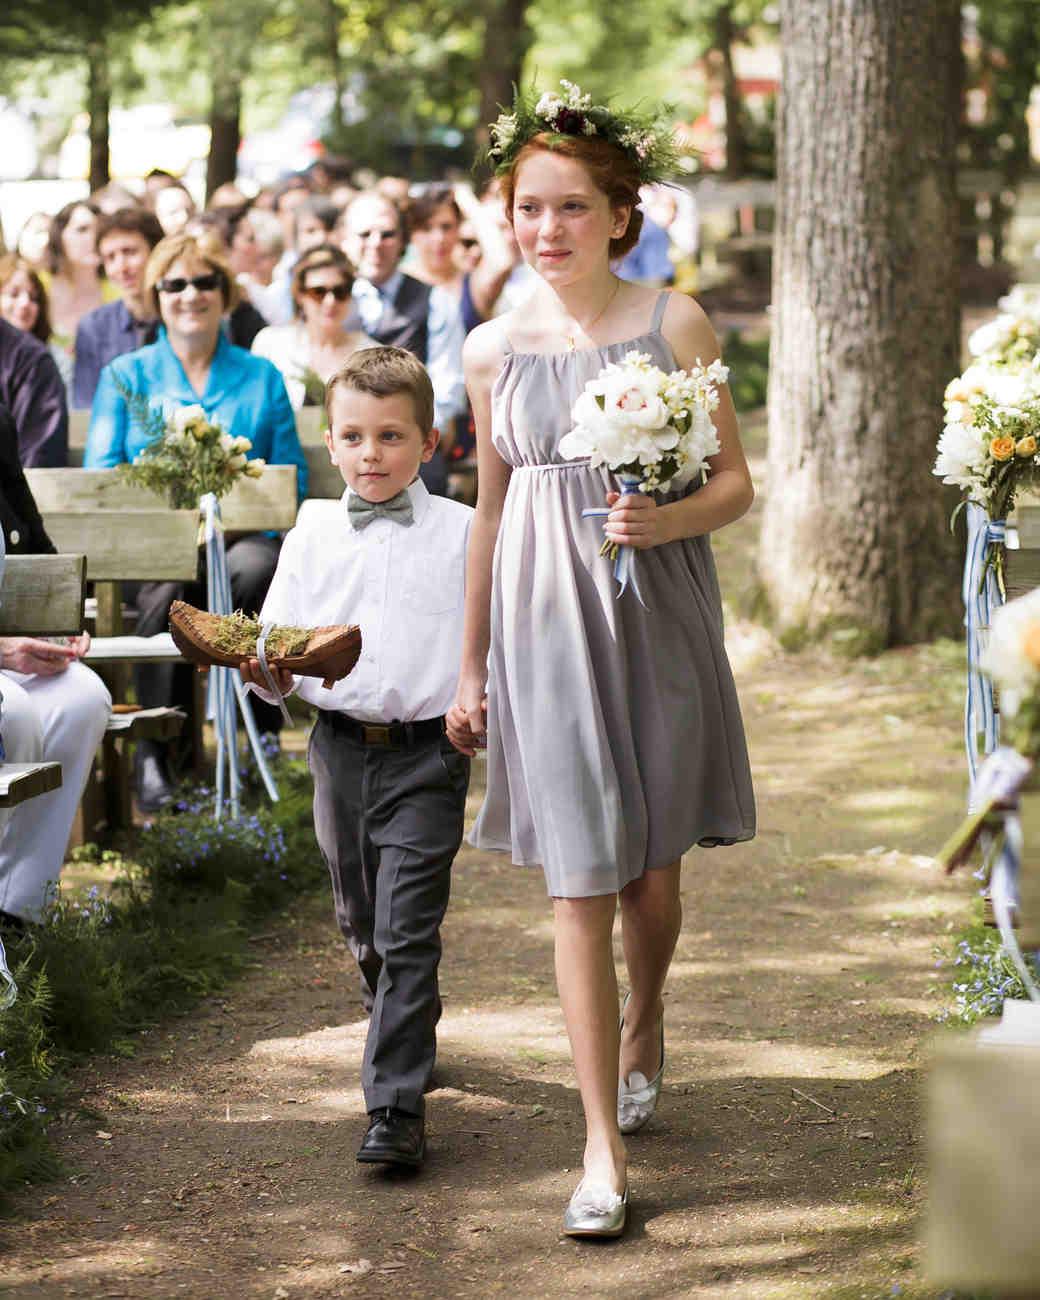 kelly-marie-dave-wedding-ceremony1-0414.jpg